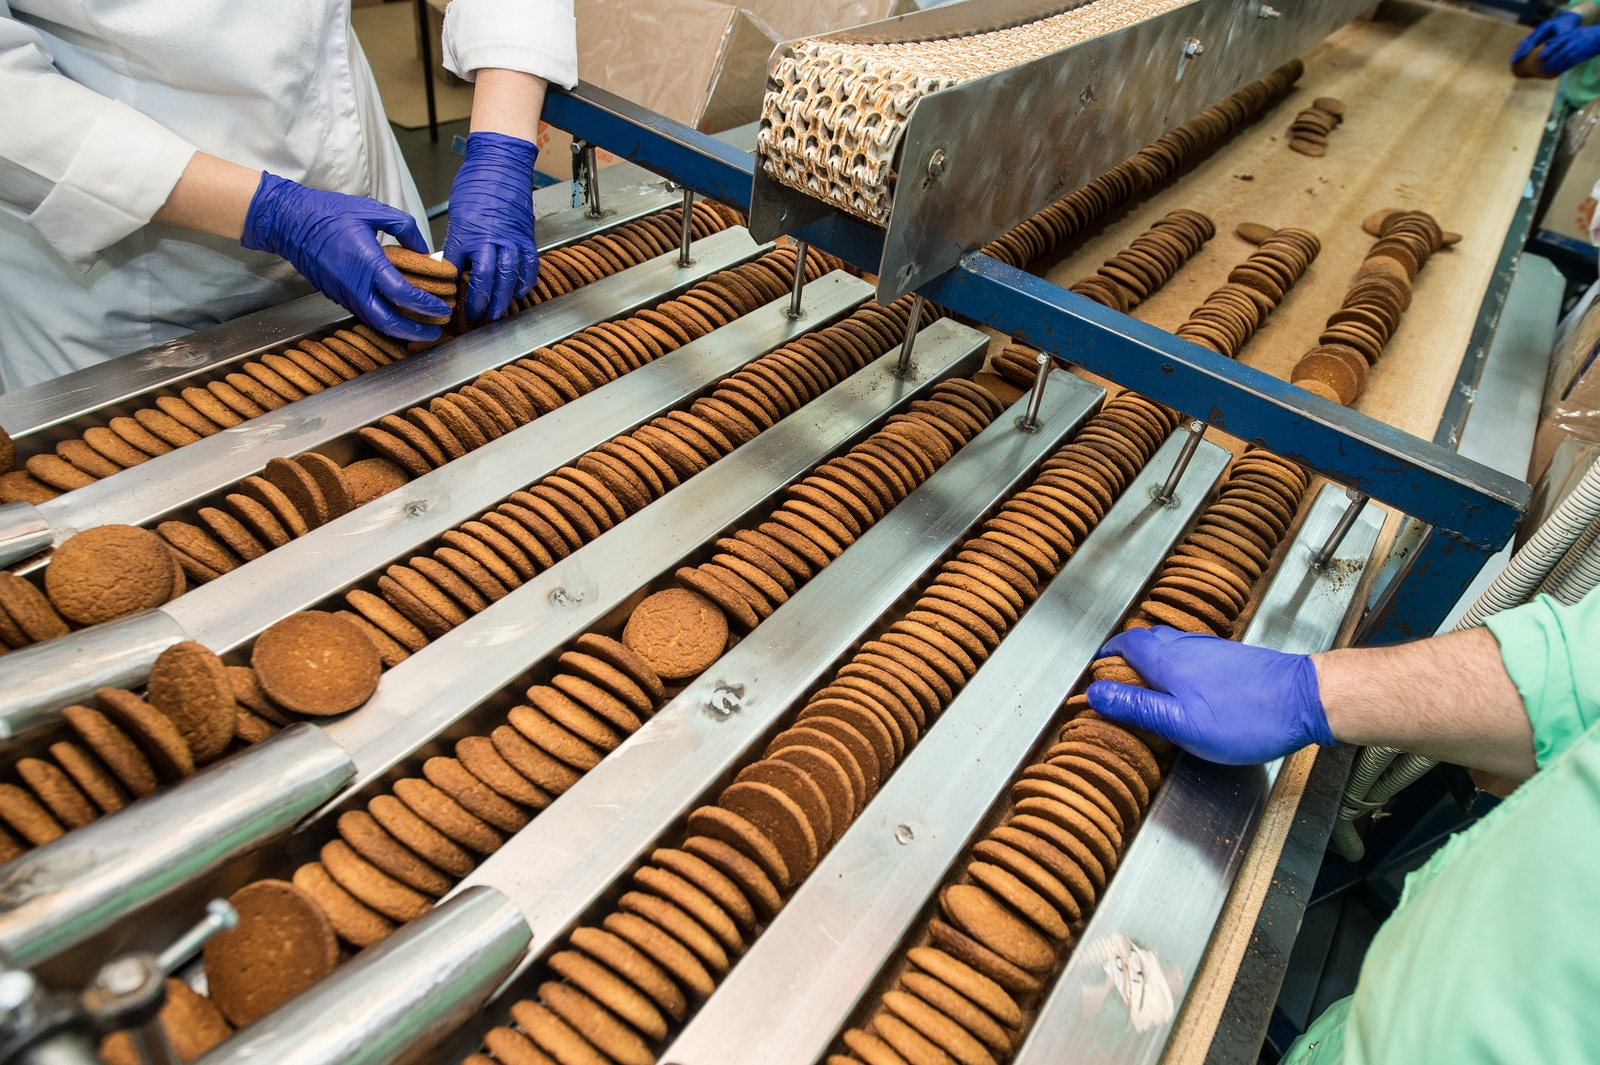 Bigstock  112061560 - Many Sweet Cake Food Factory Massive Production